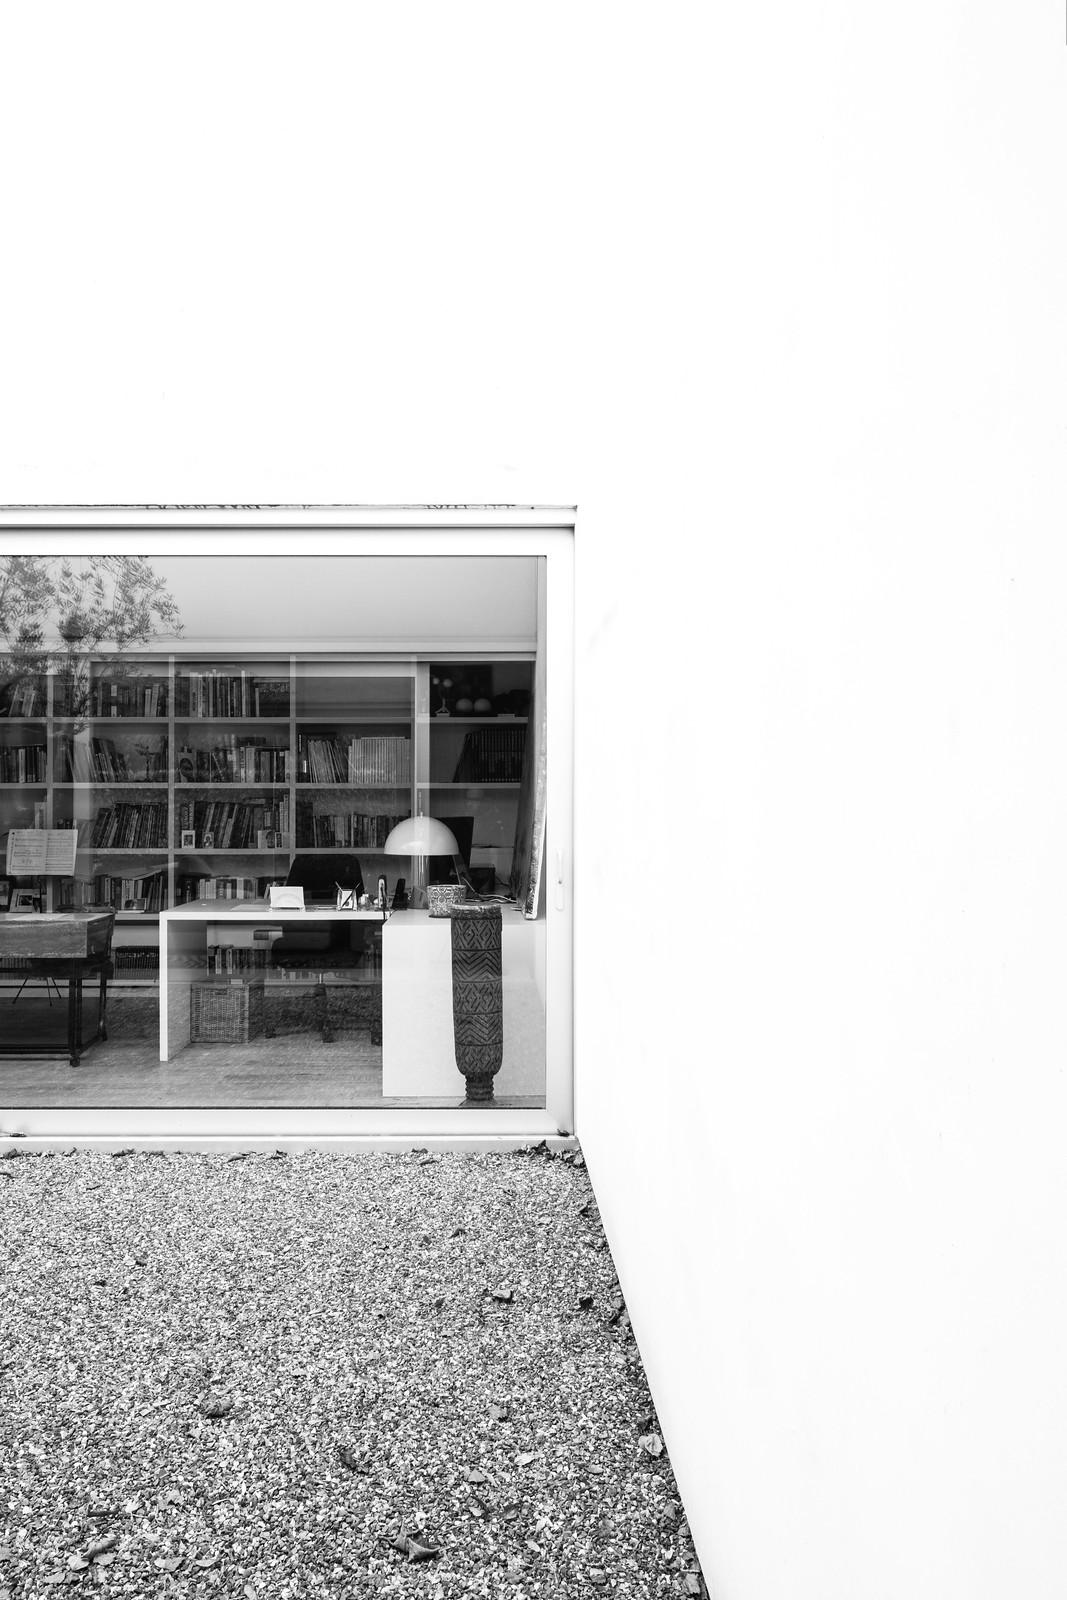 Architect: Pascal François - www.pascalfrancois.be